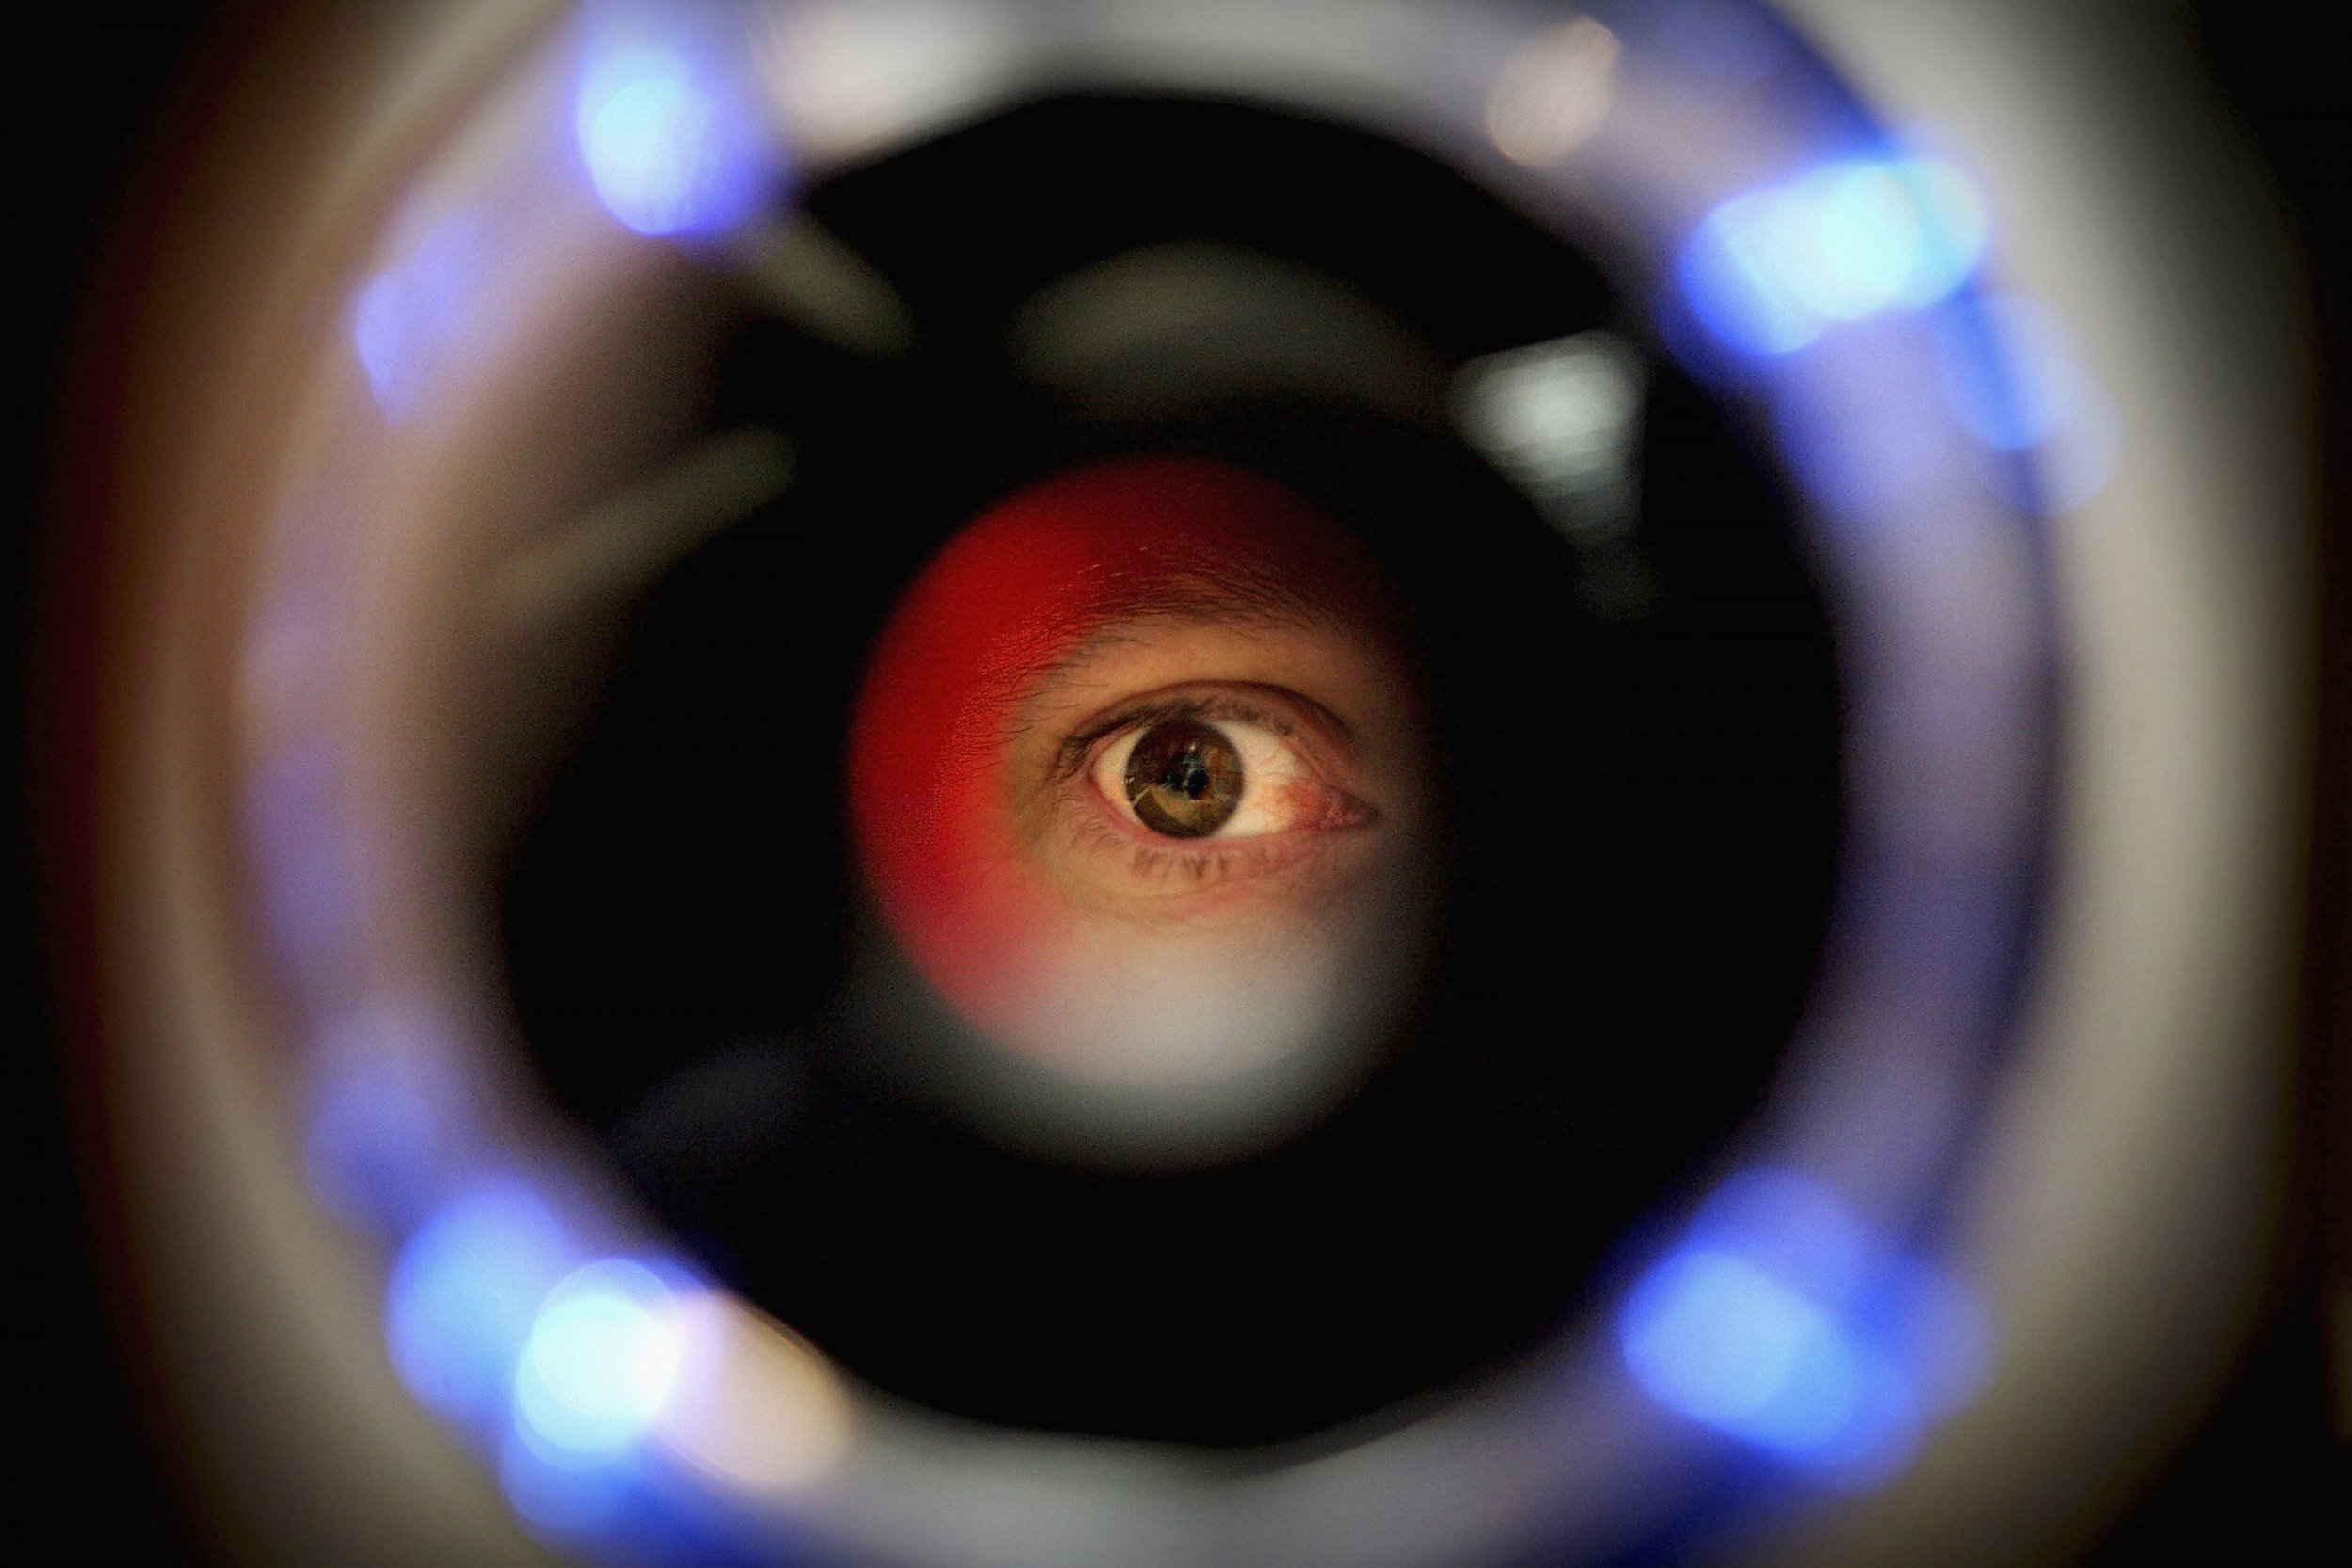 Biometrics iris recognition scanner